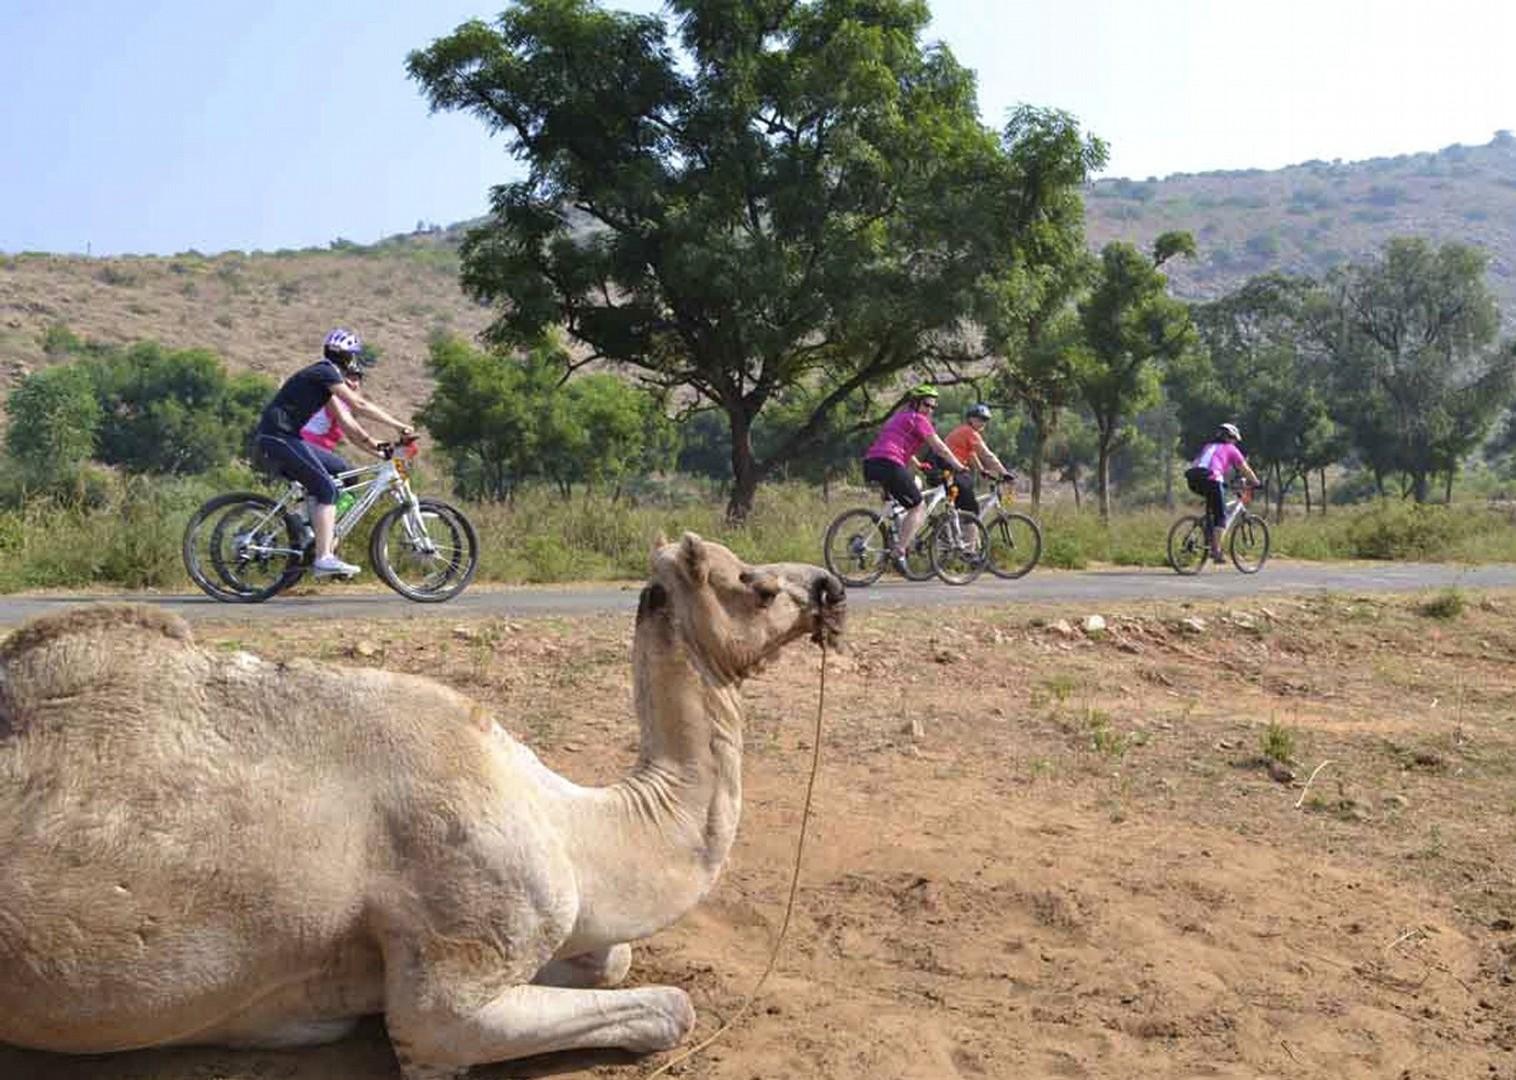 cycling-adventure-holiday-rajasthan-camel.jpg - India - Palaces and Lakes of Rajasthan - Cycling Adventures